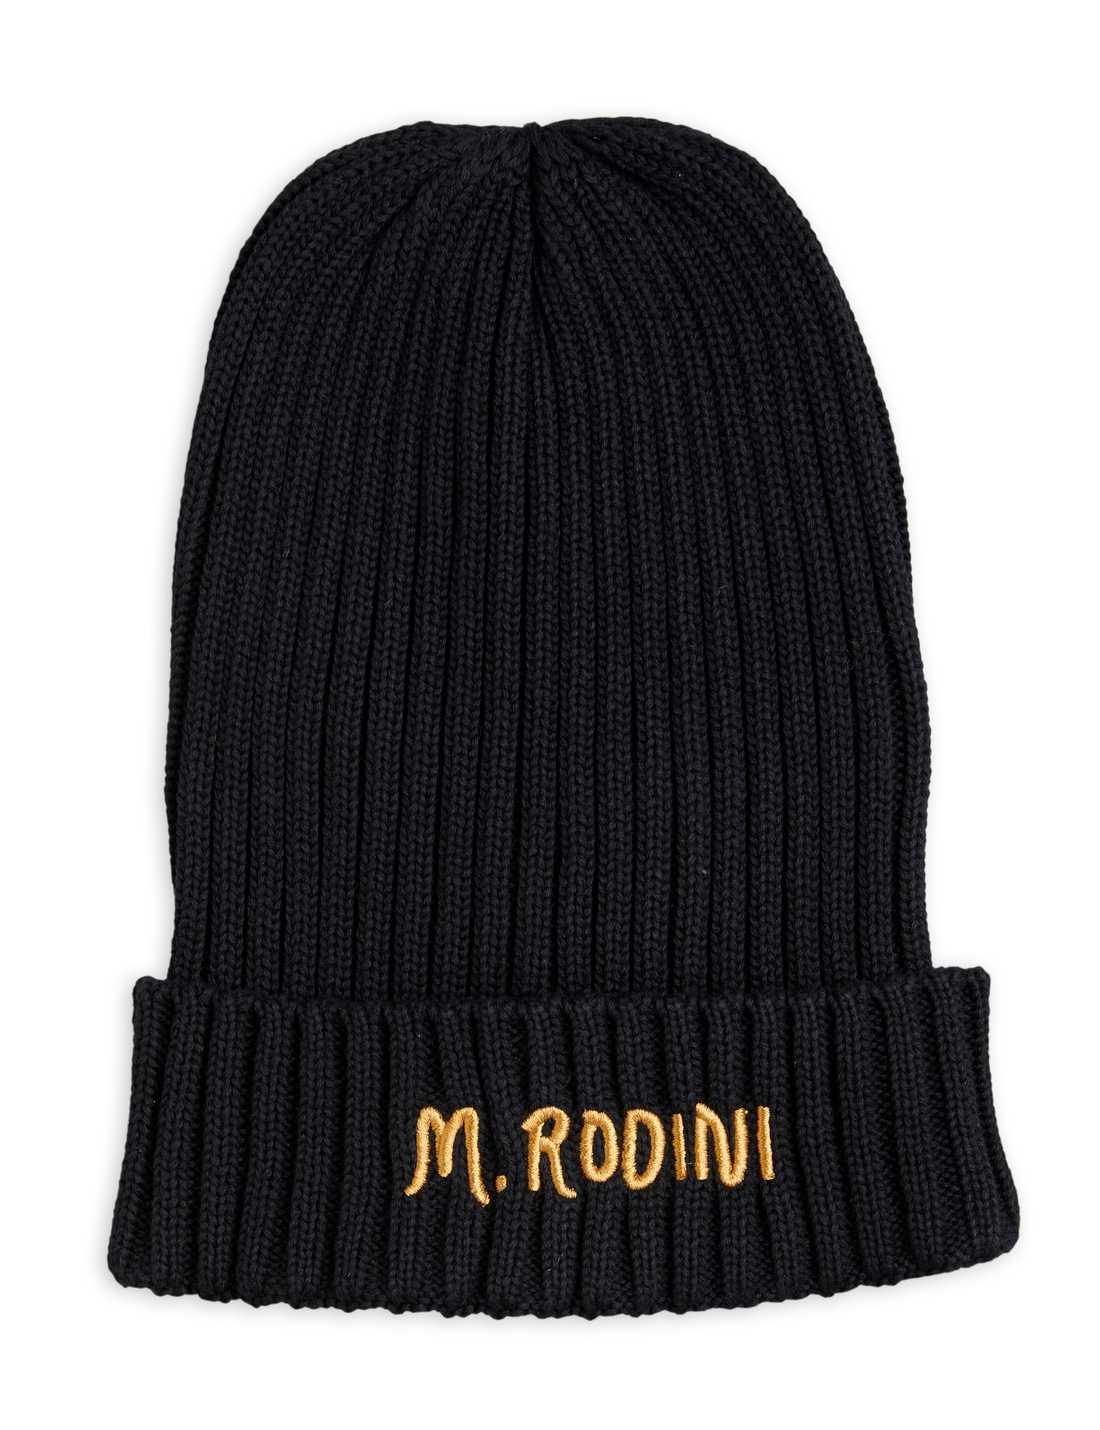 MINI RODINI FOLD UP RIB HAT BLACK